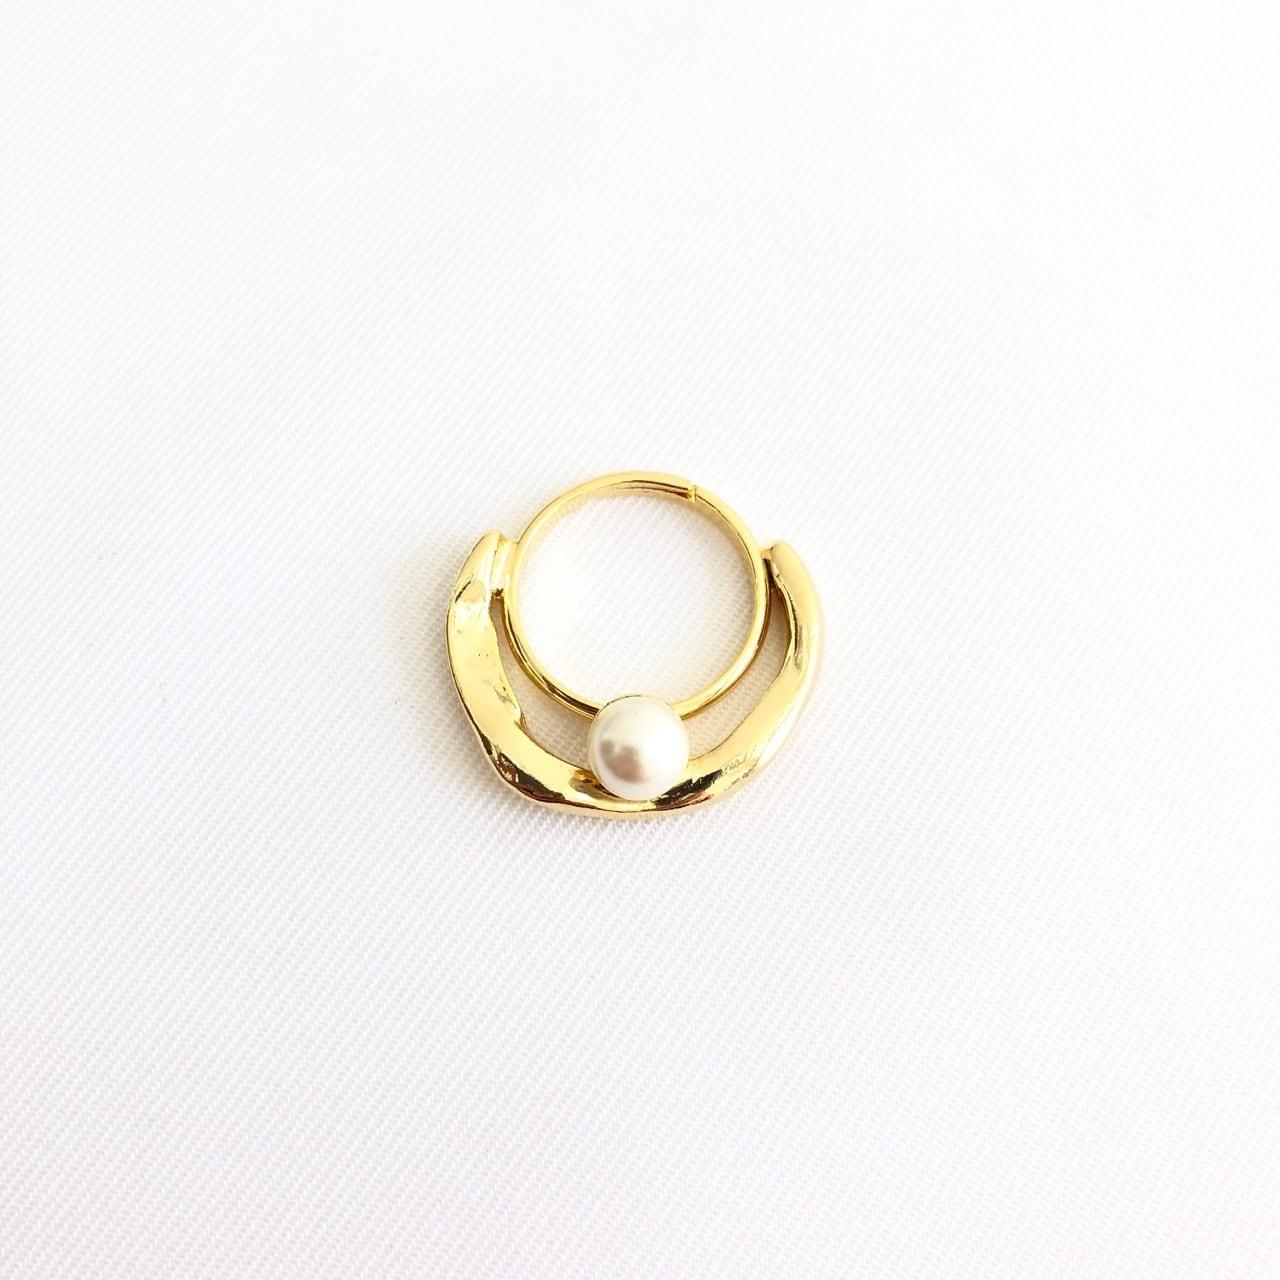 【 SeadsMara 】- 19A3-20 - petit wave pearl ring